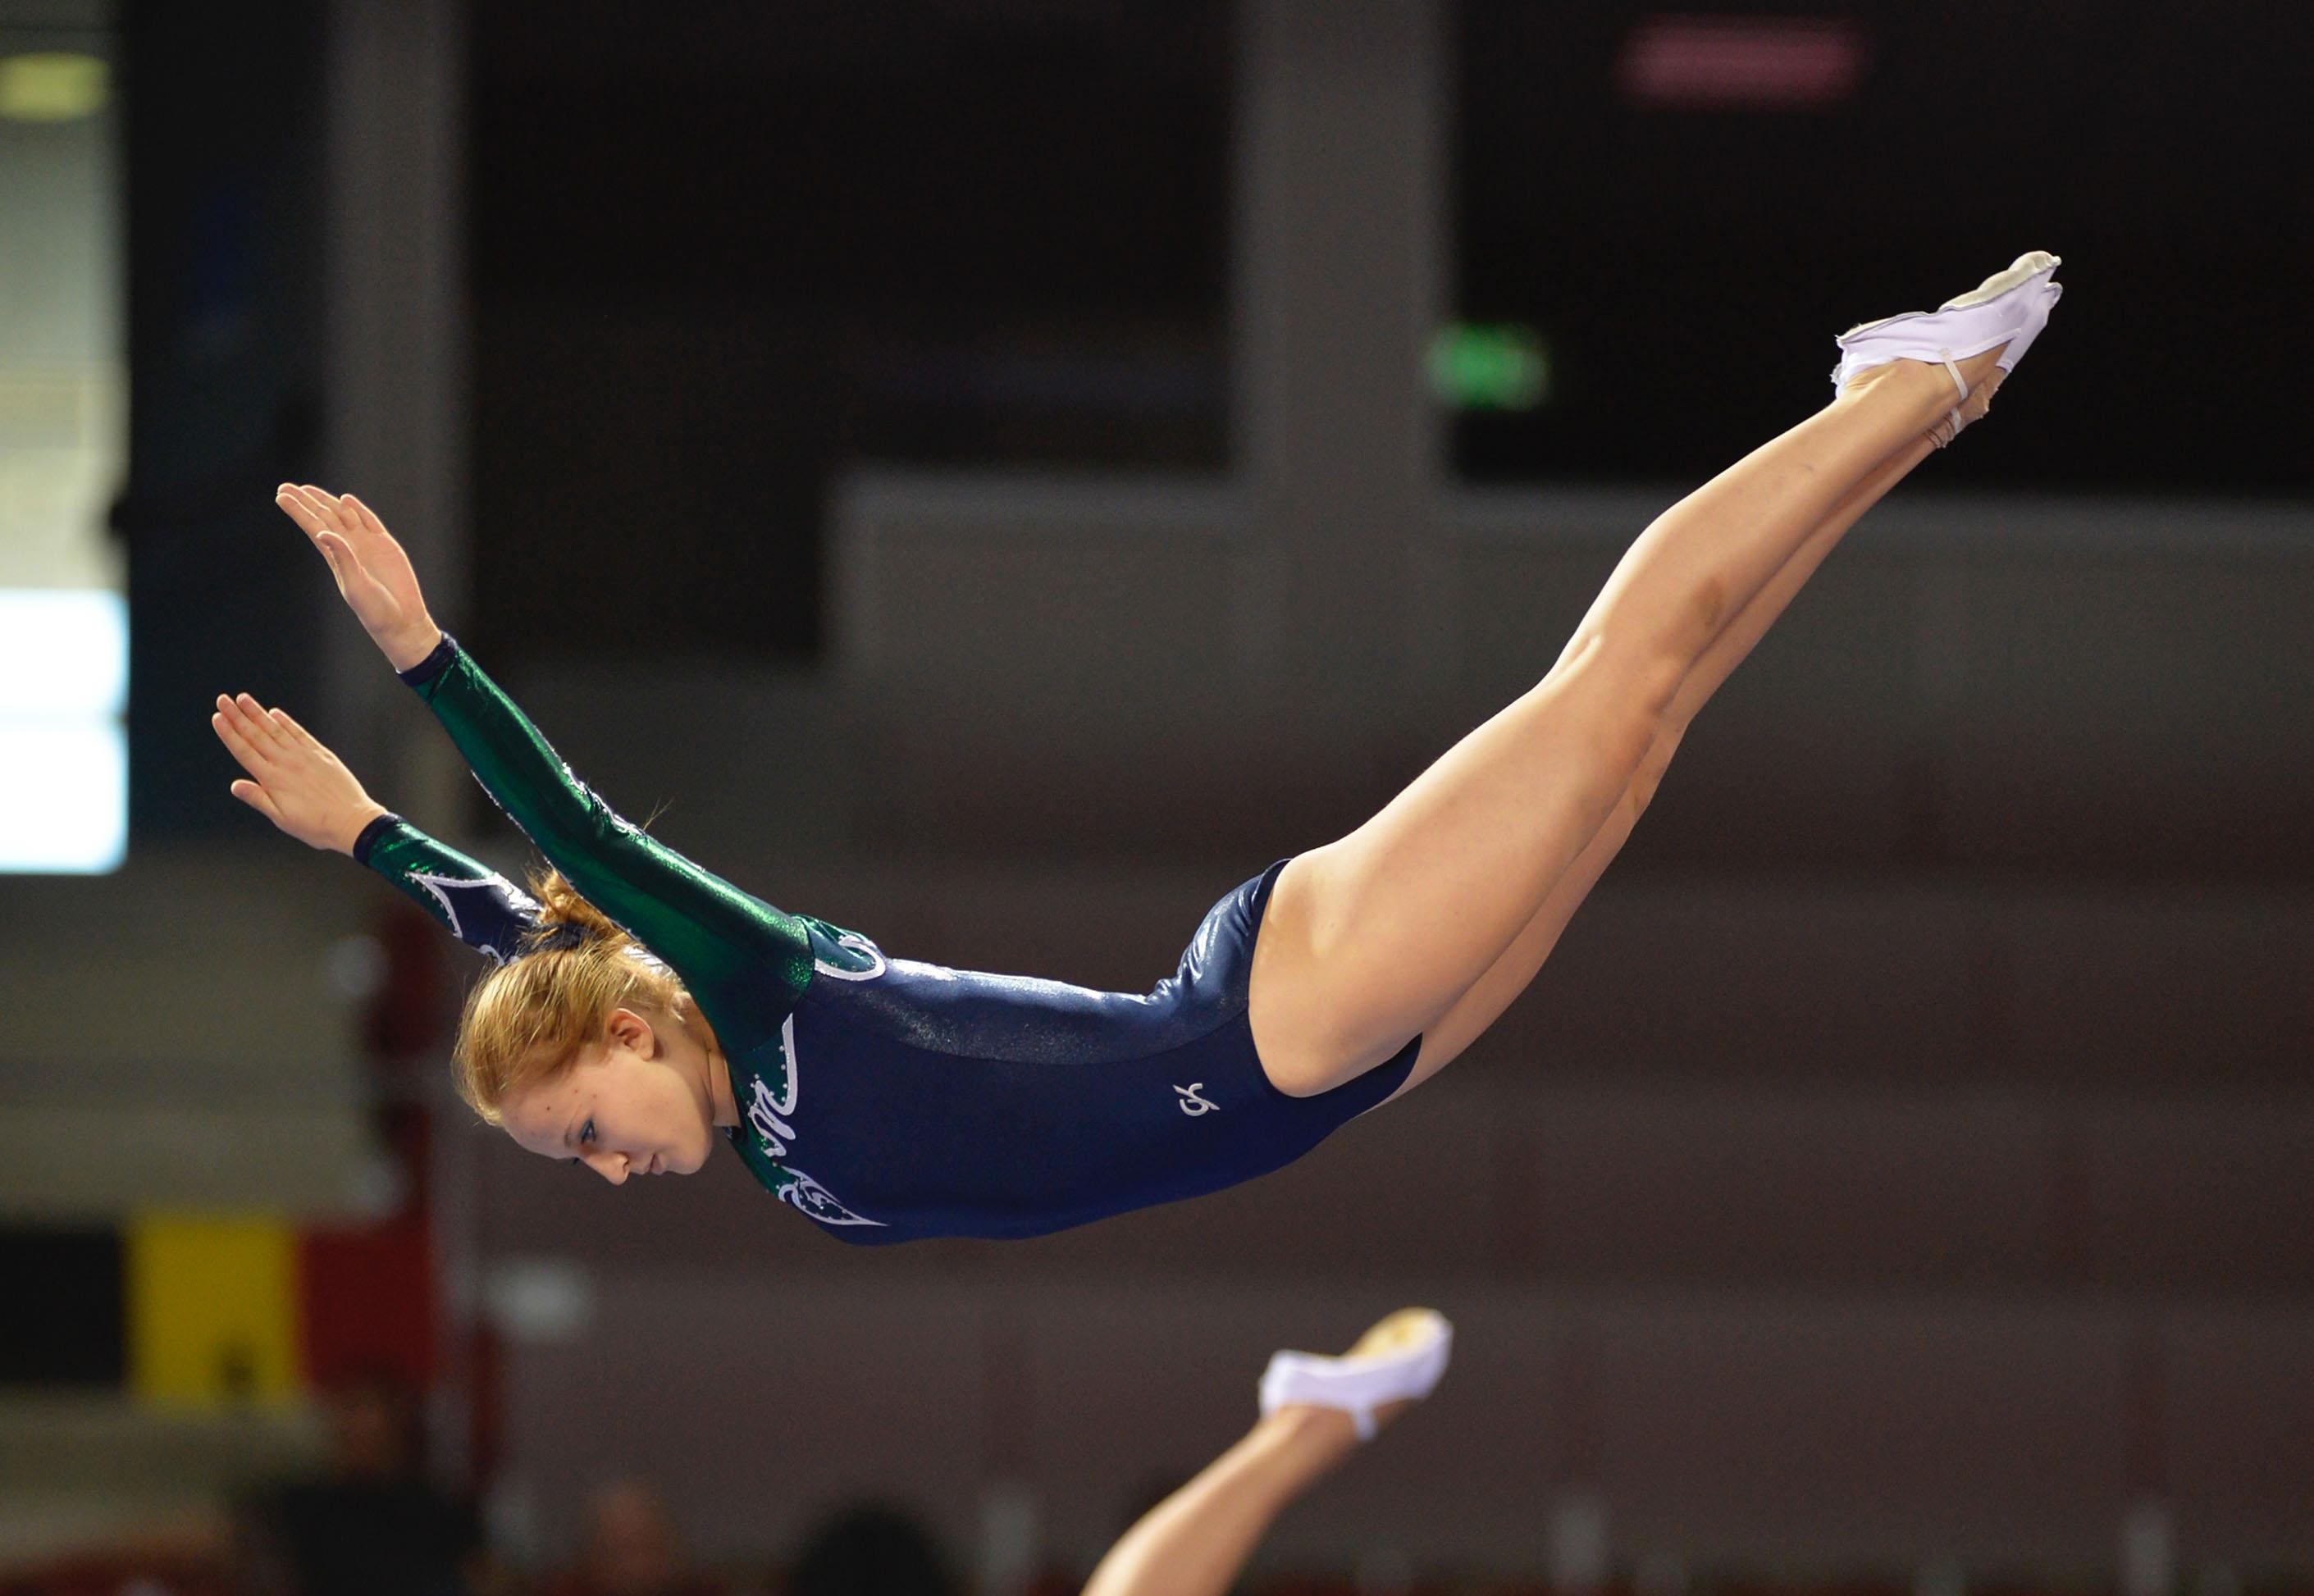 Gymnastics Australia Announces Womens Artistic World